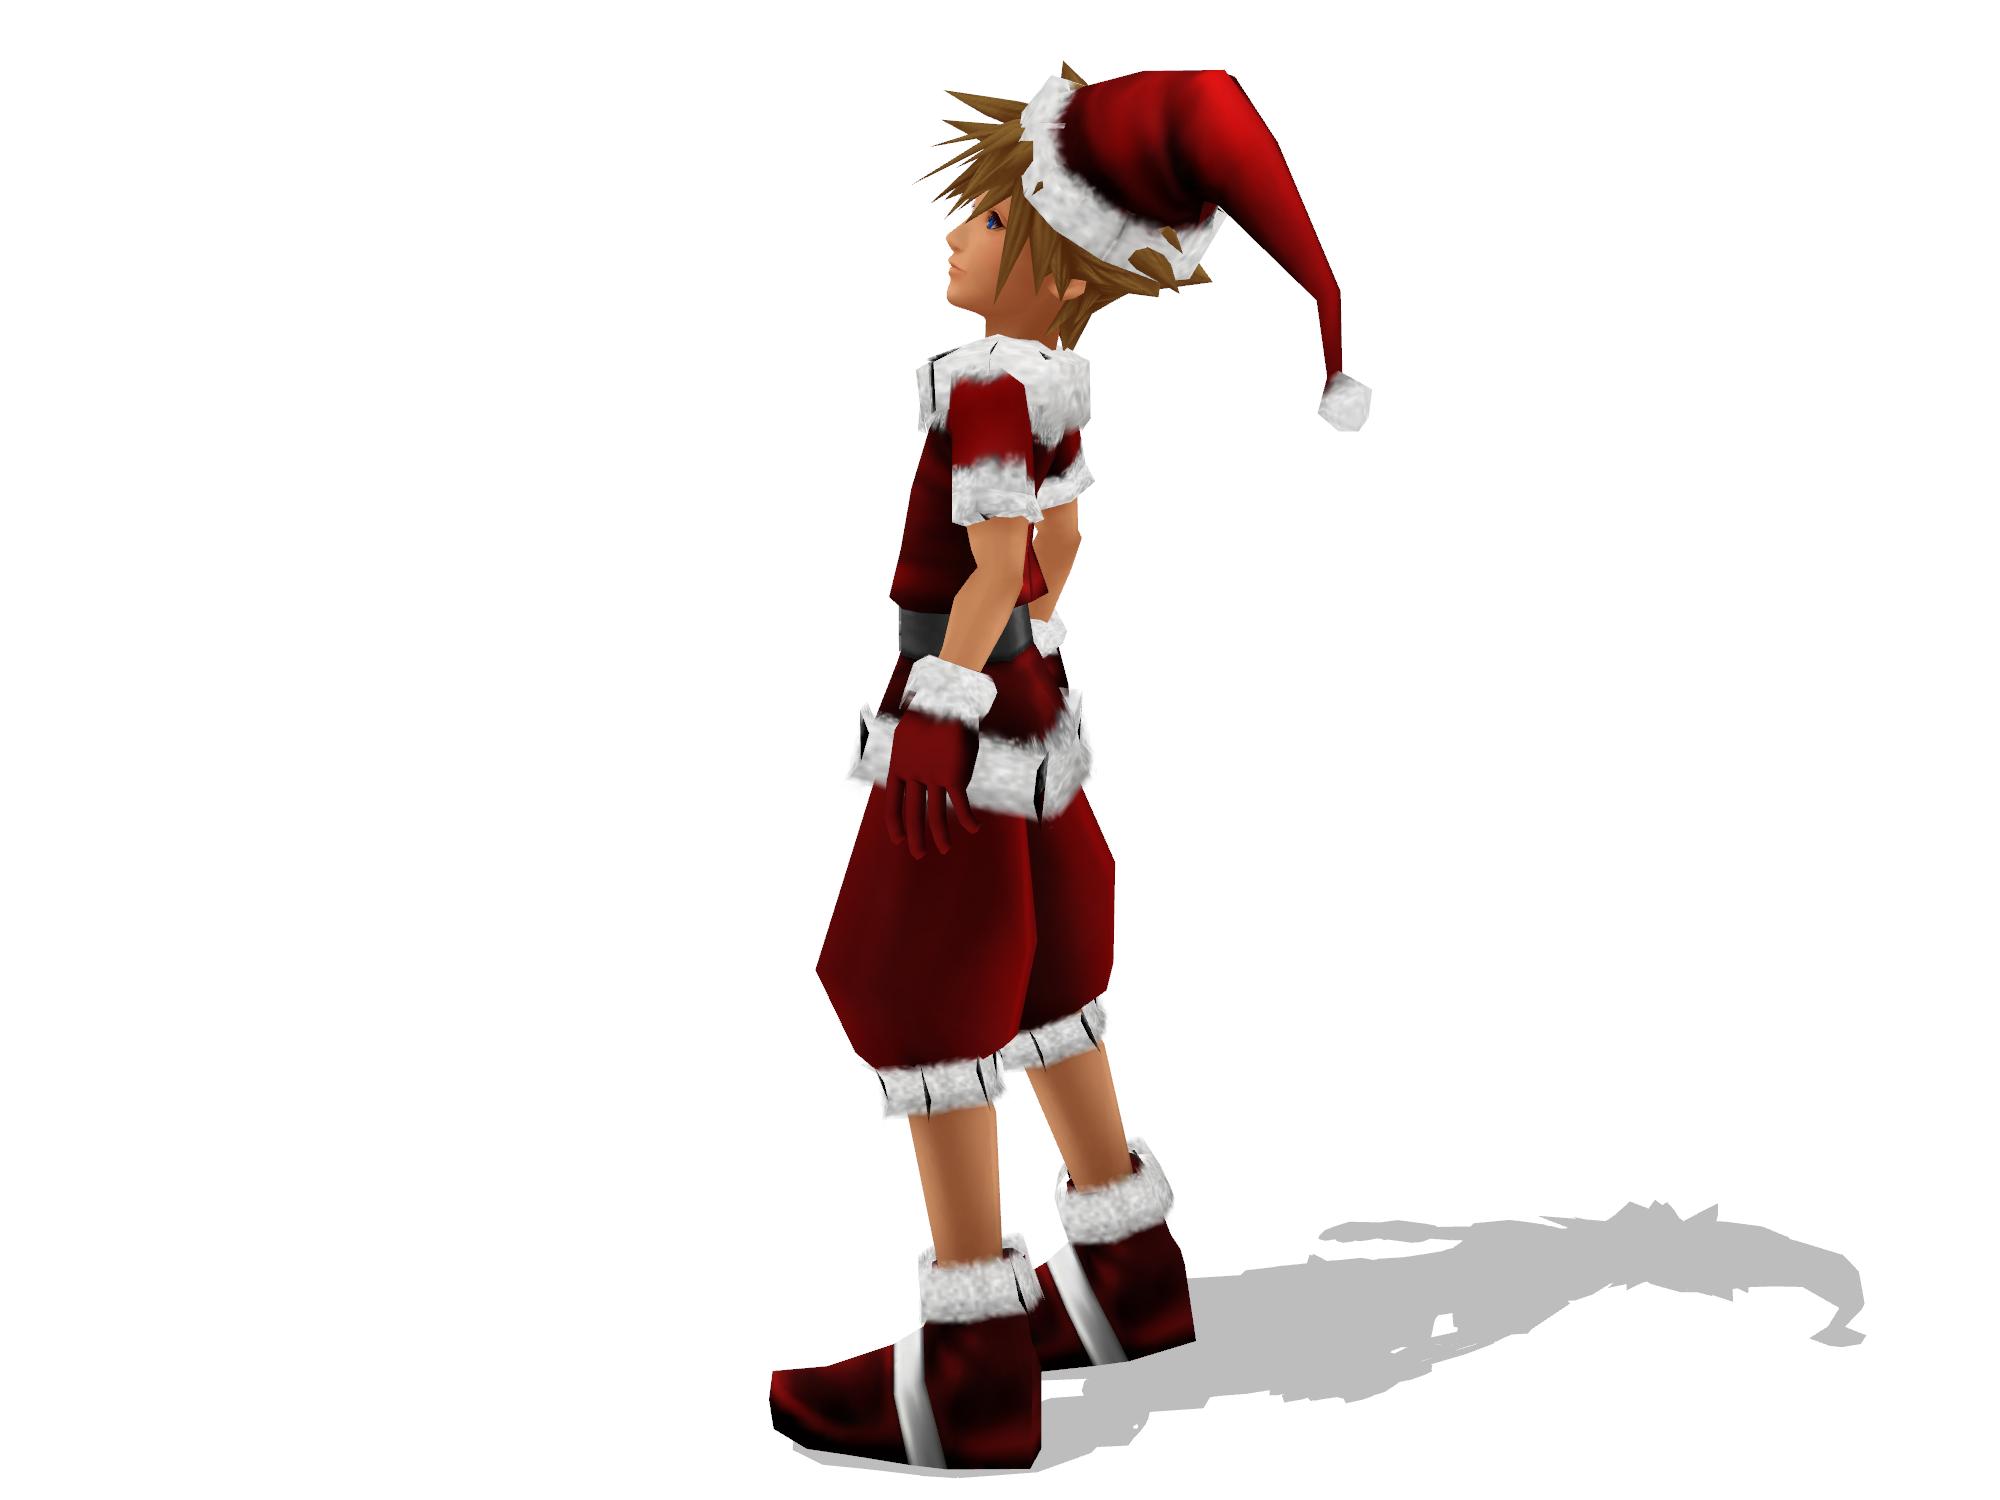 Kingdom Hearts Christmas.Merry Early Christmas From Sora Image Kingdom Hearts Fan